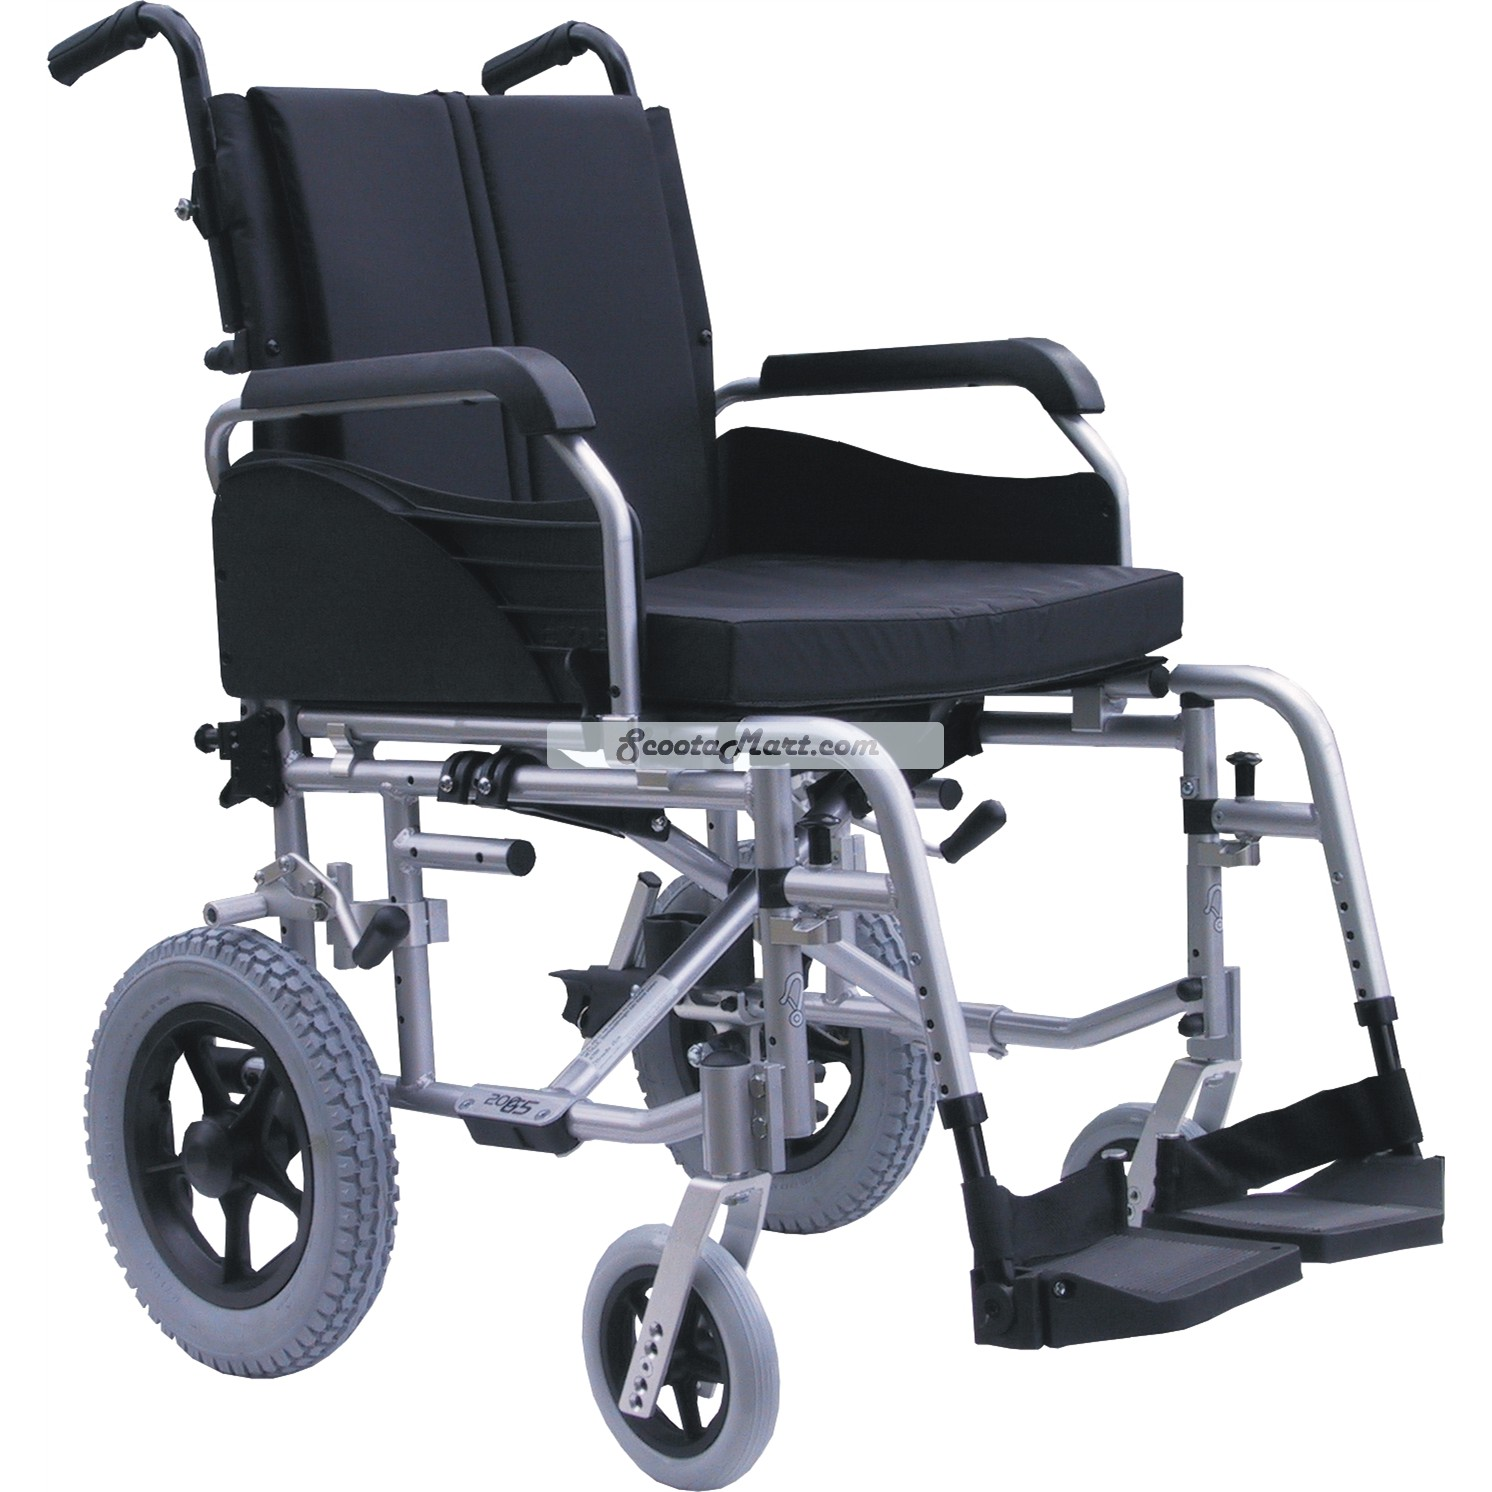 Image Wheelchairjpg Criminal Case Wiki – Wheal Chair